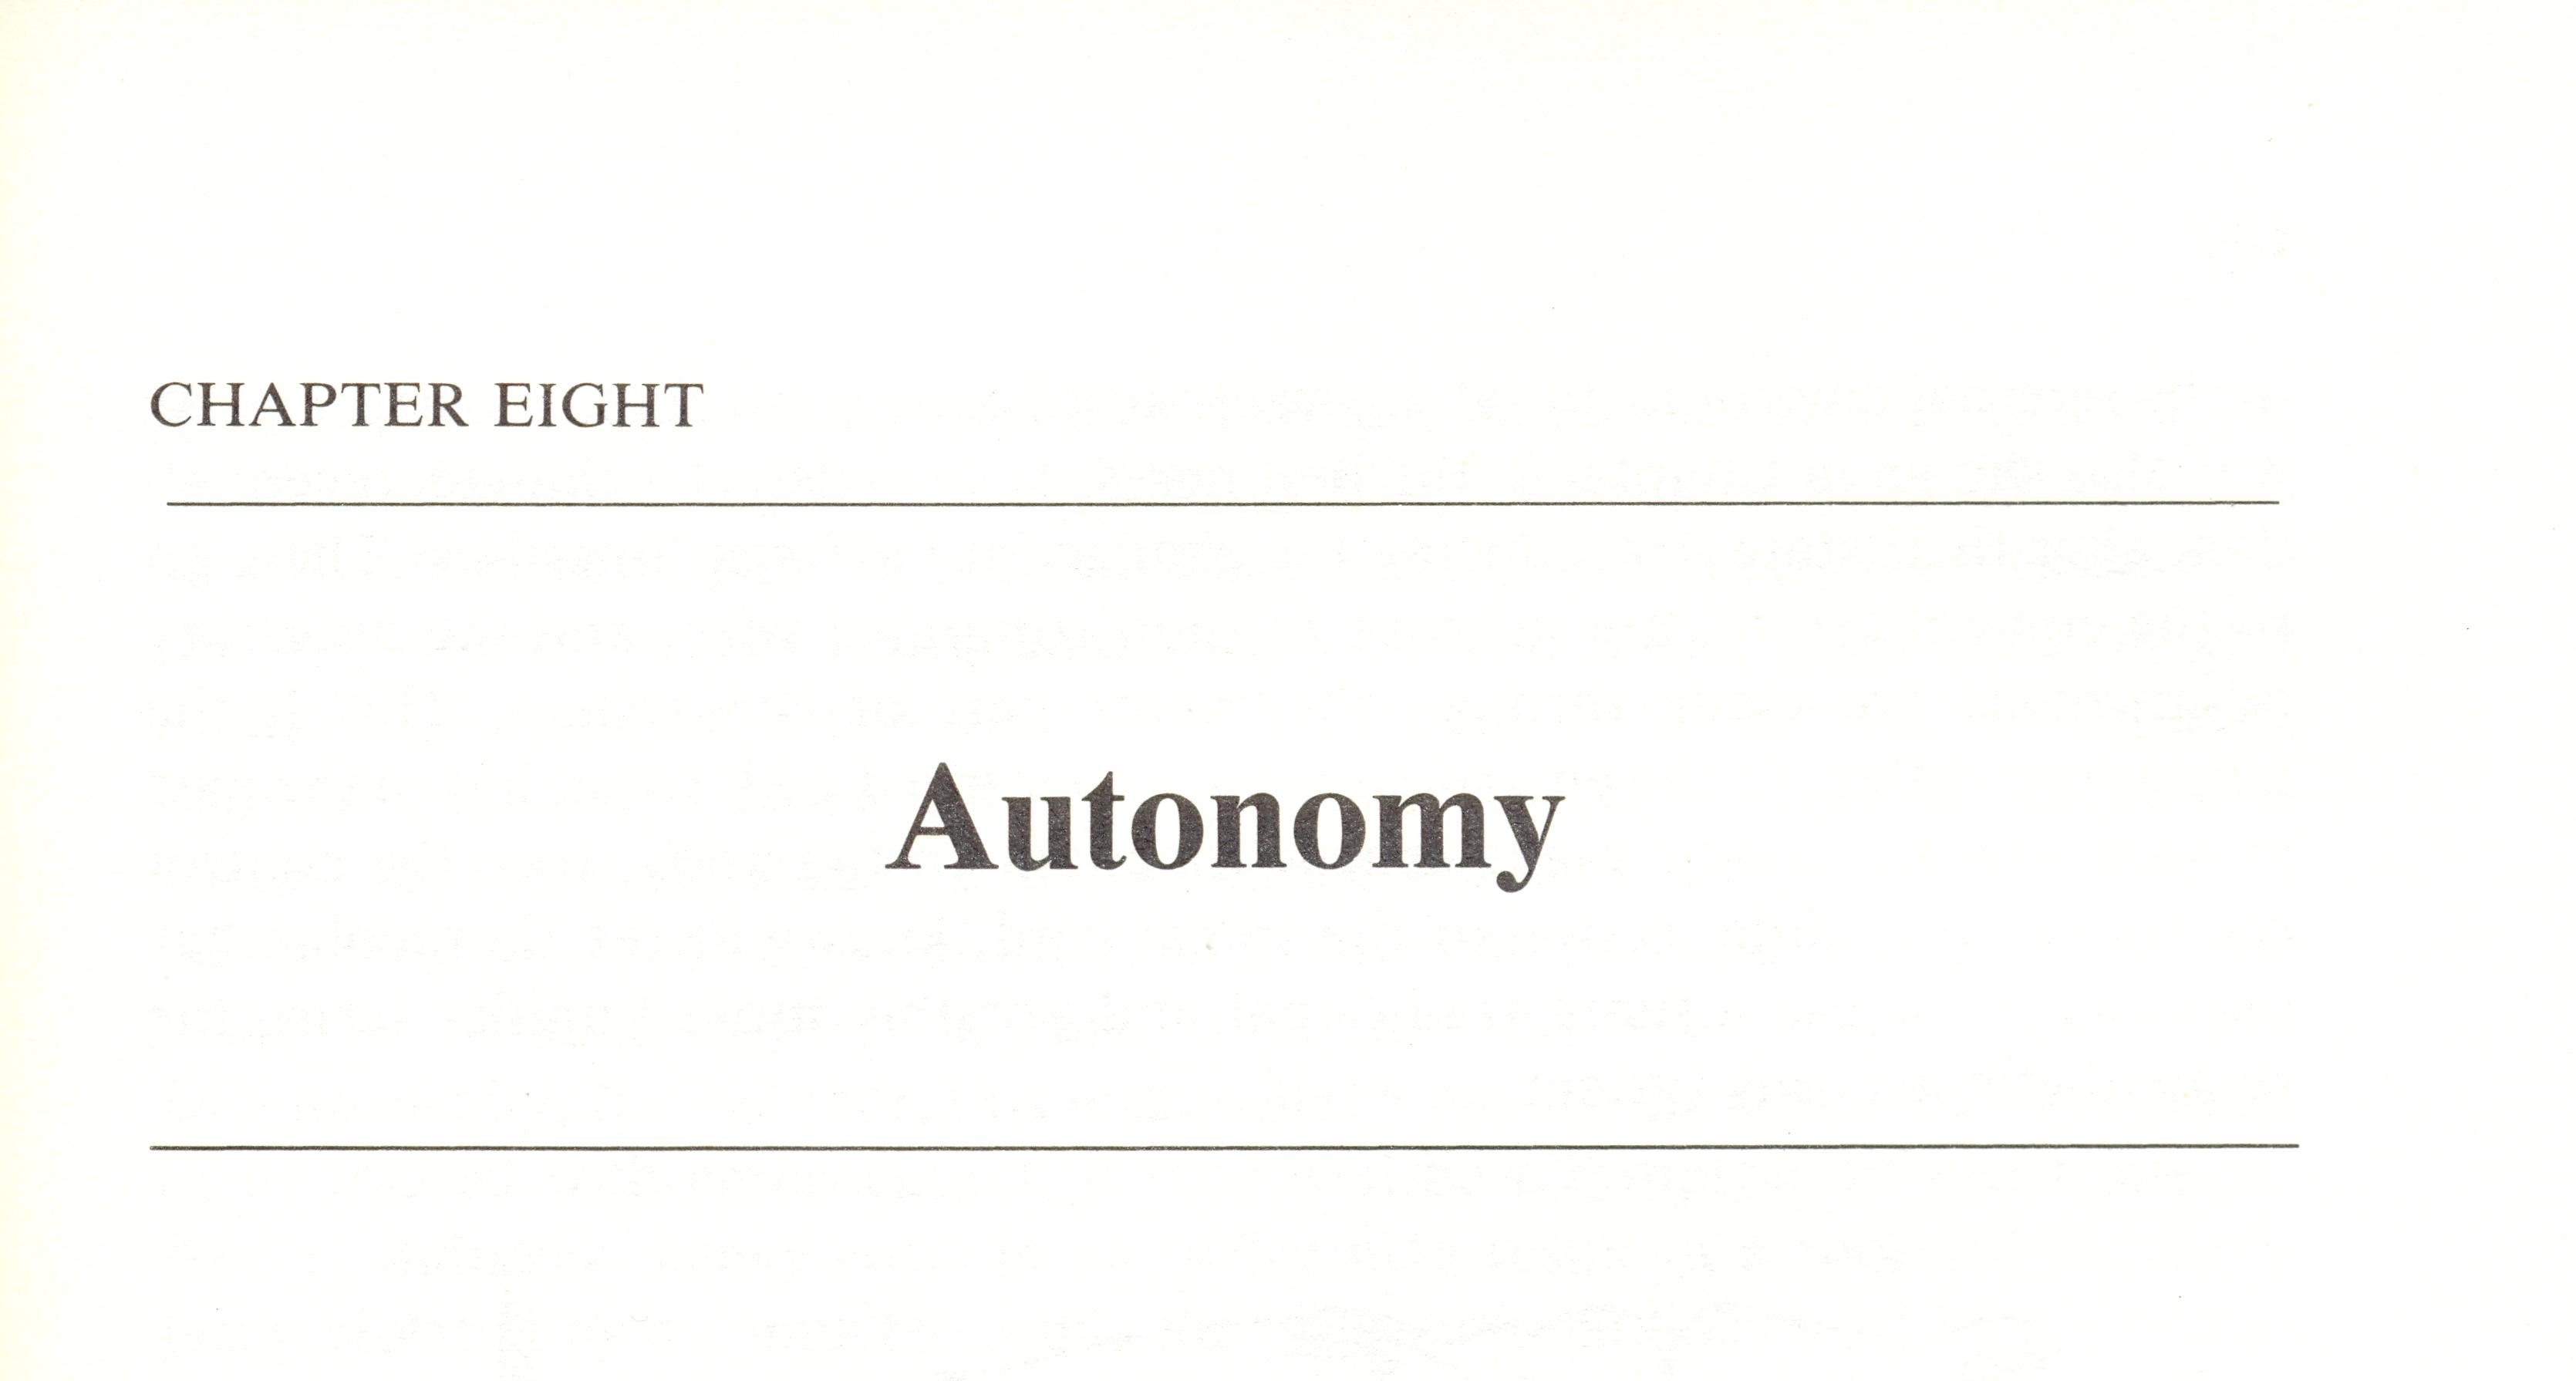 Autonomy (chapter title)